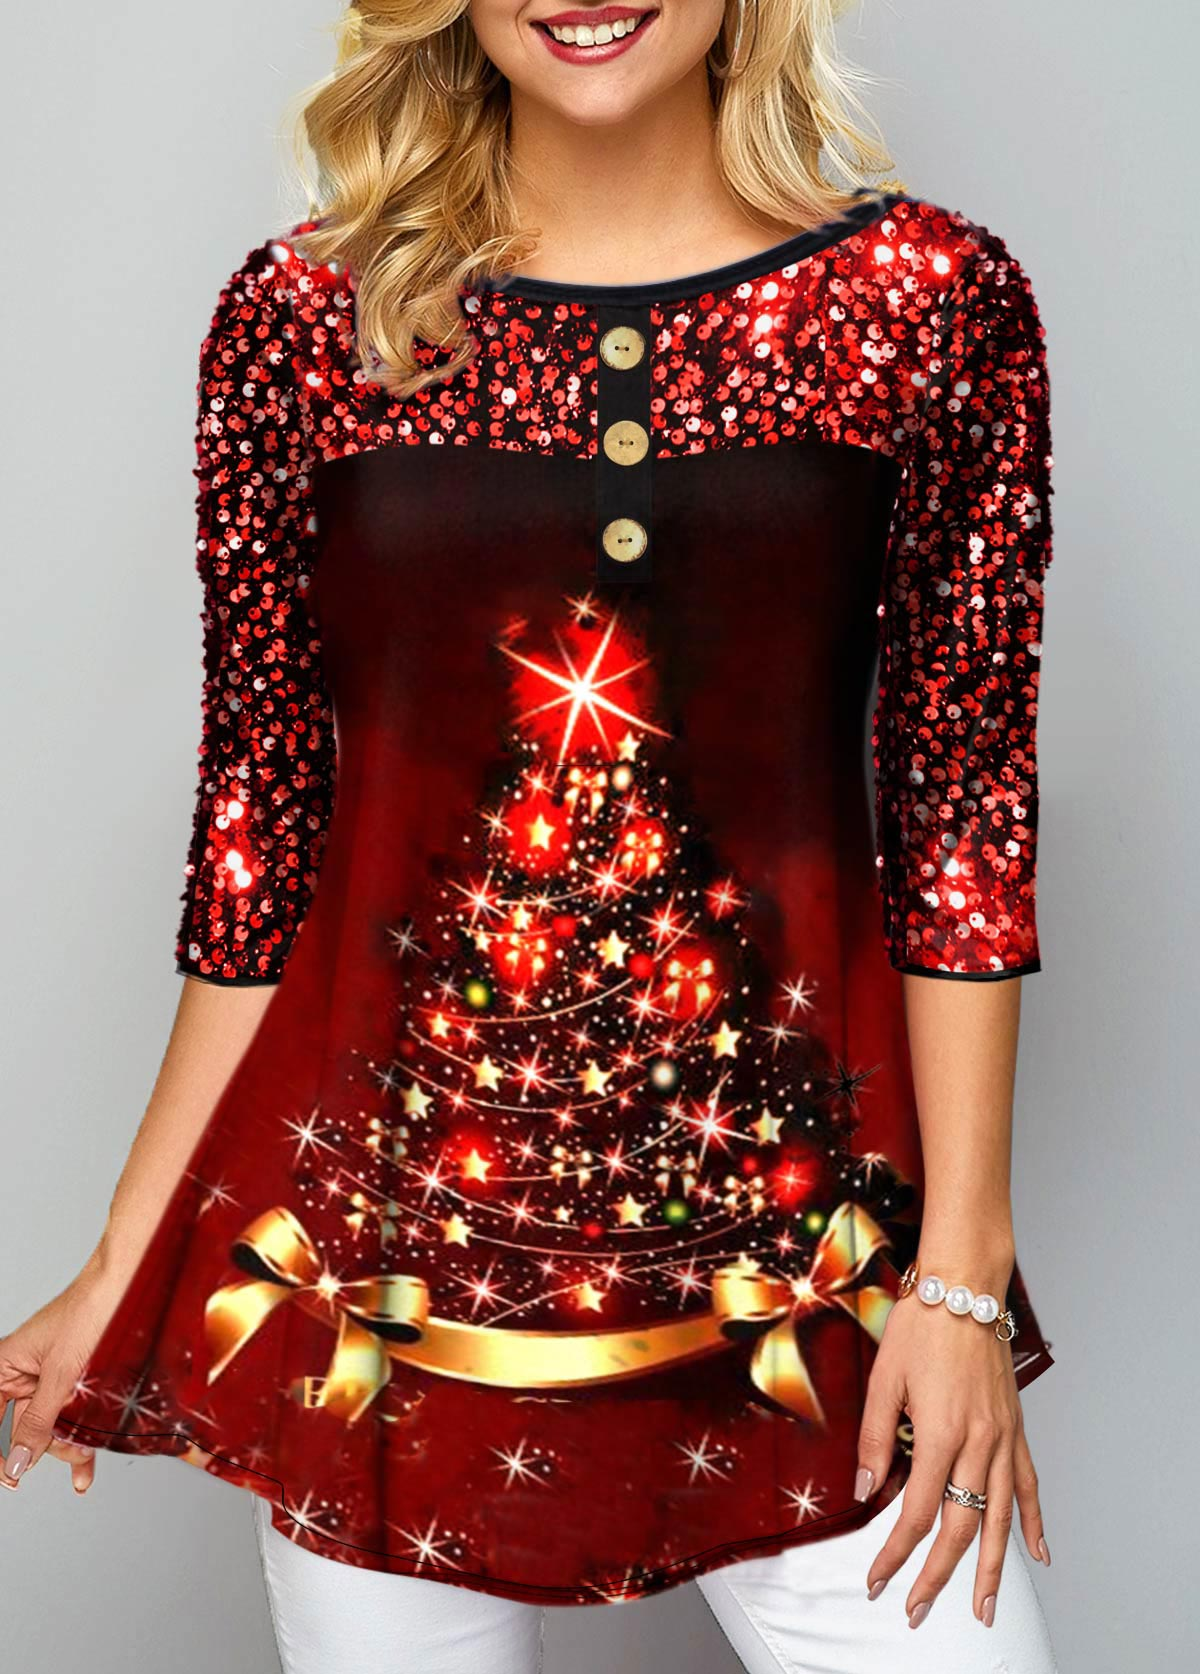 Christmas Tree Print Sequin Embellished T Shirt